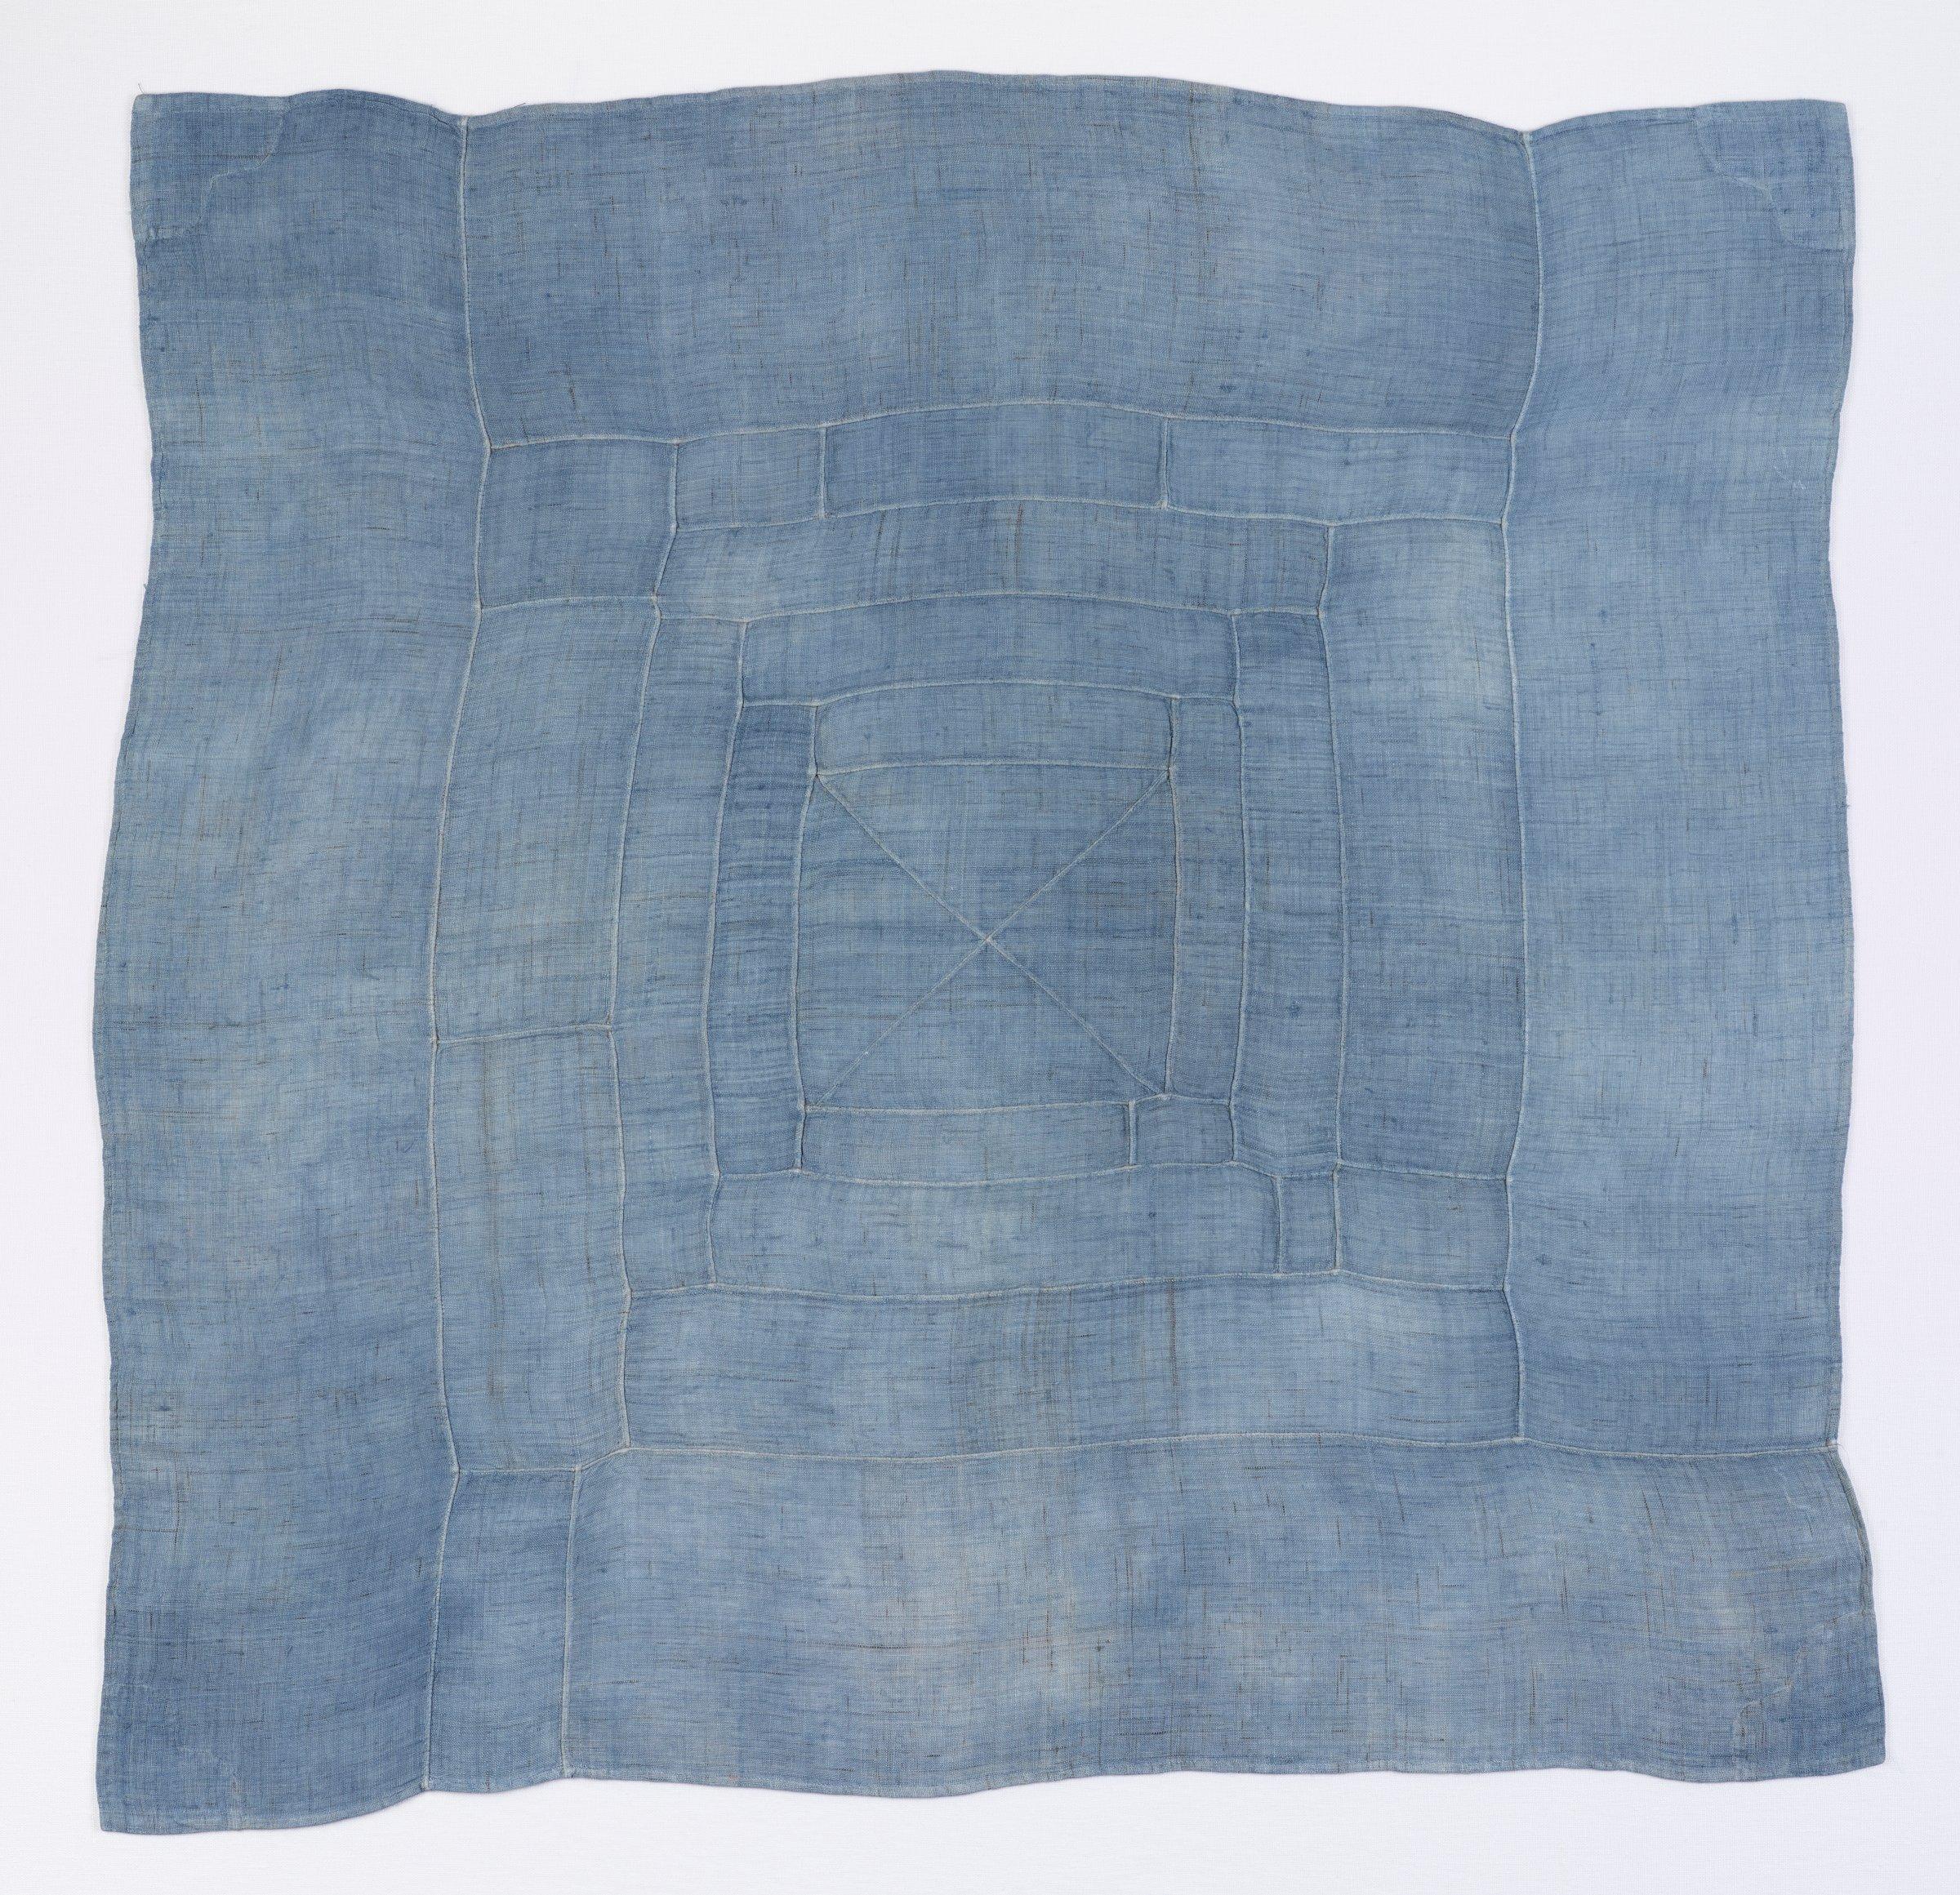 Monochrome Blue Wrapping Cloth (Bojagi), Korea, silk and cotton